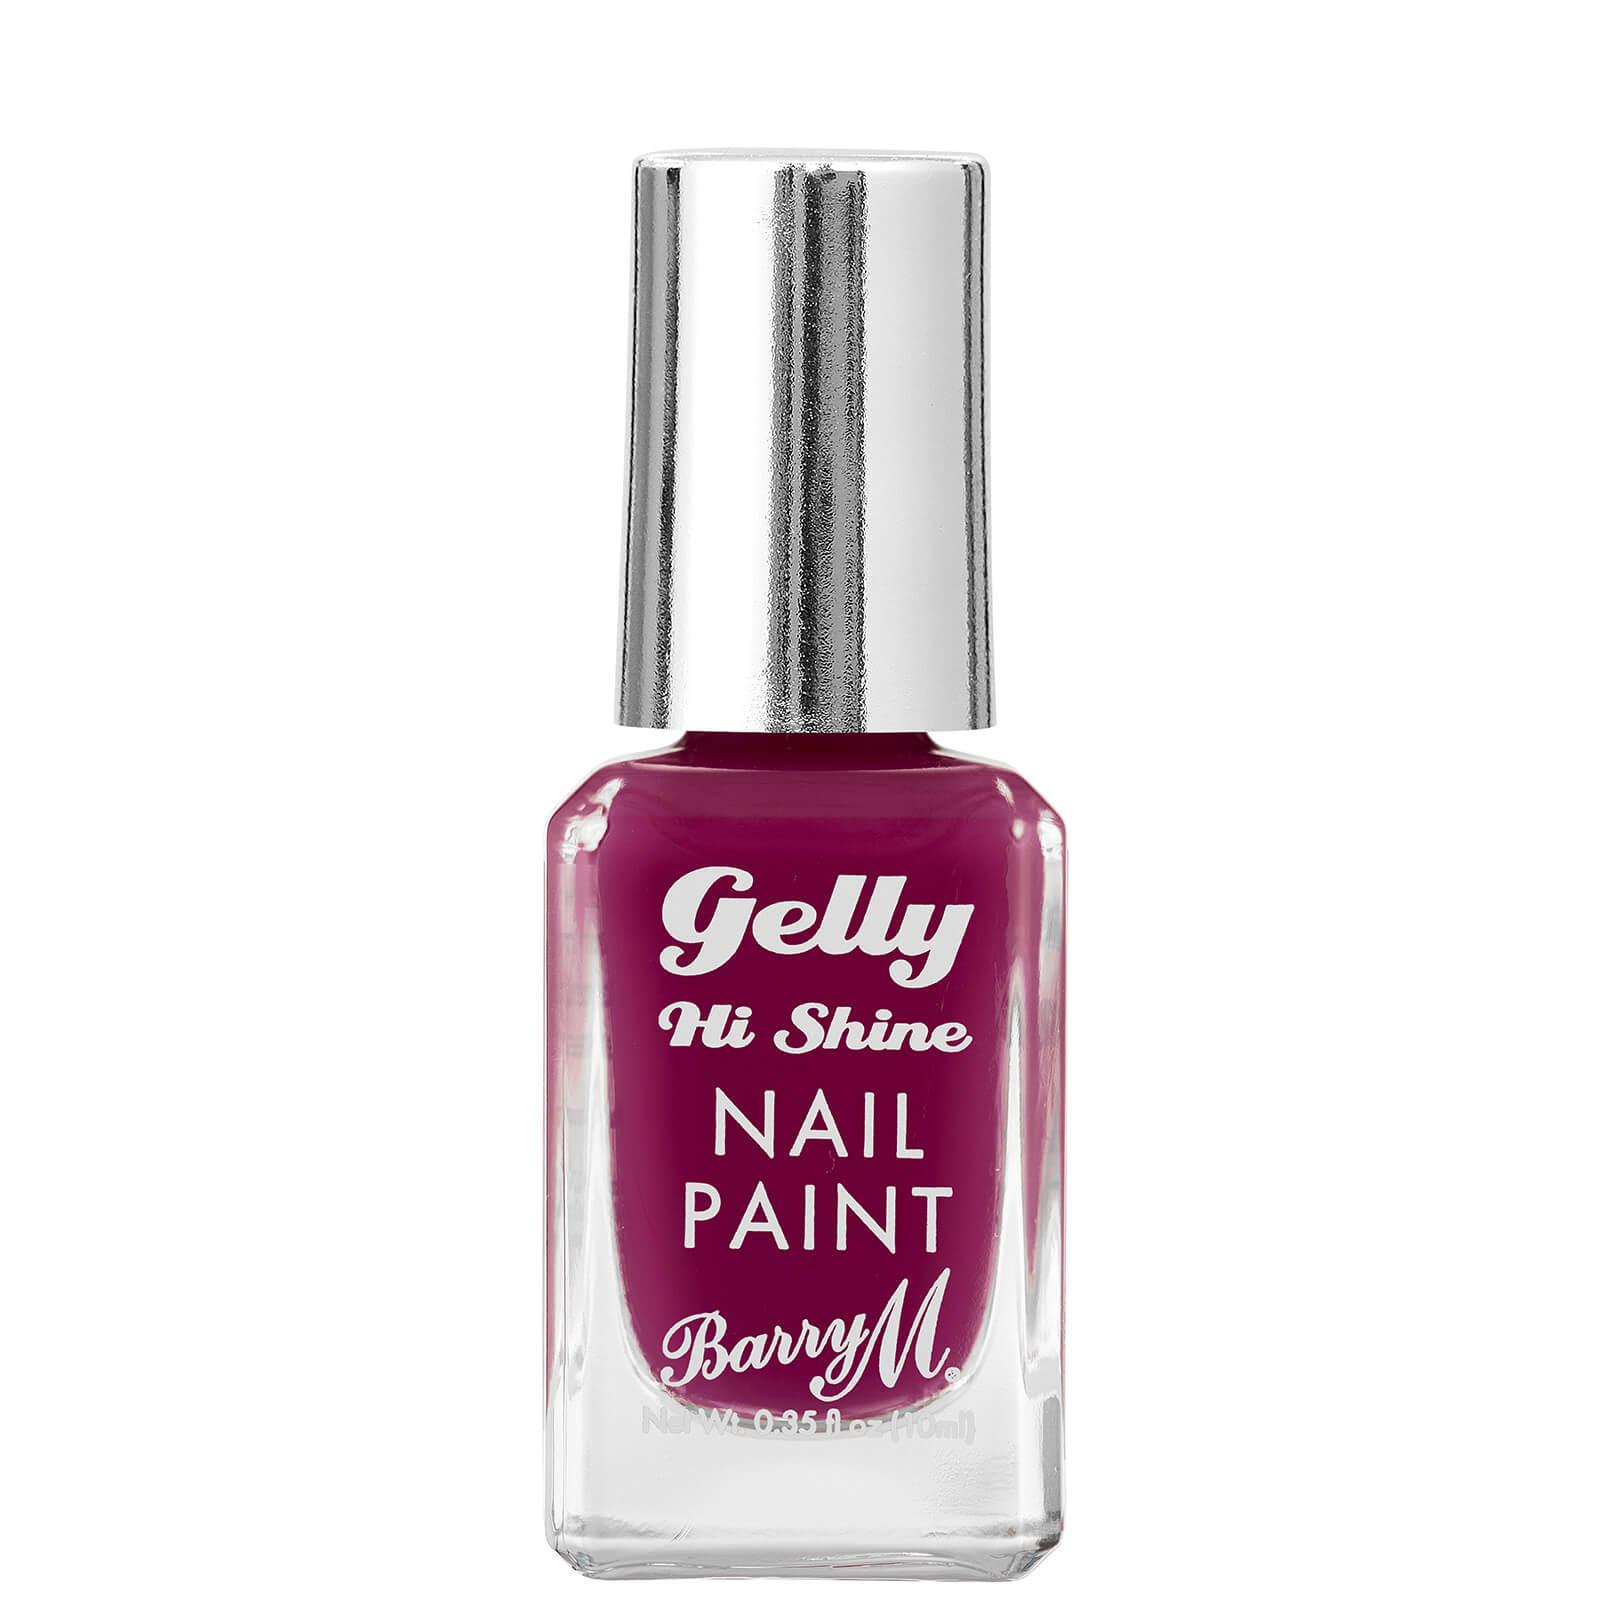 Купить Barry M Cosmetics Gelly Nail Paint 10ml (Various Shades) - Plum Jam